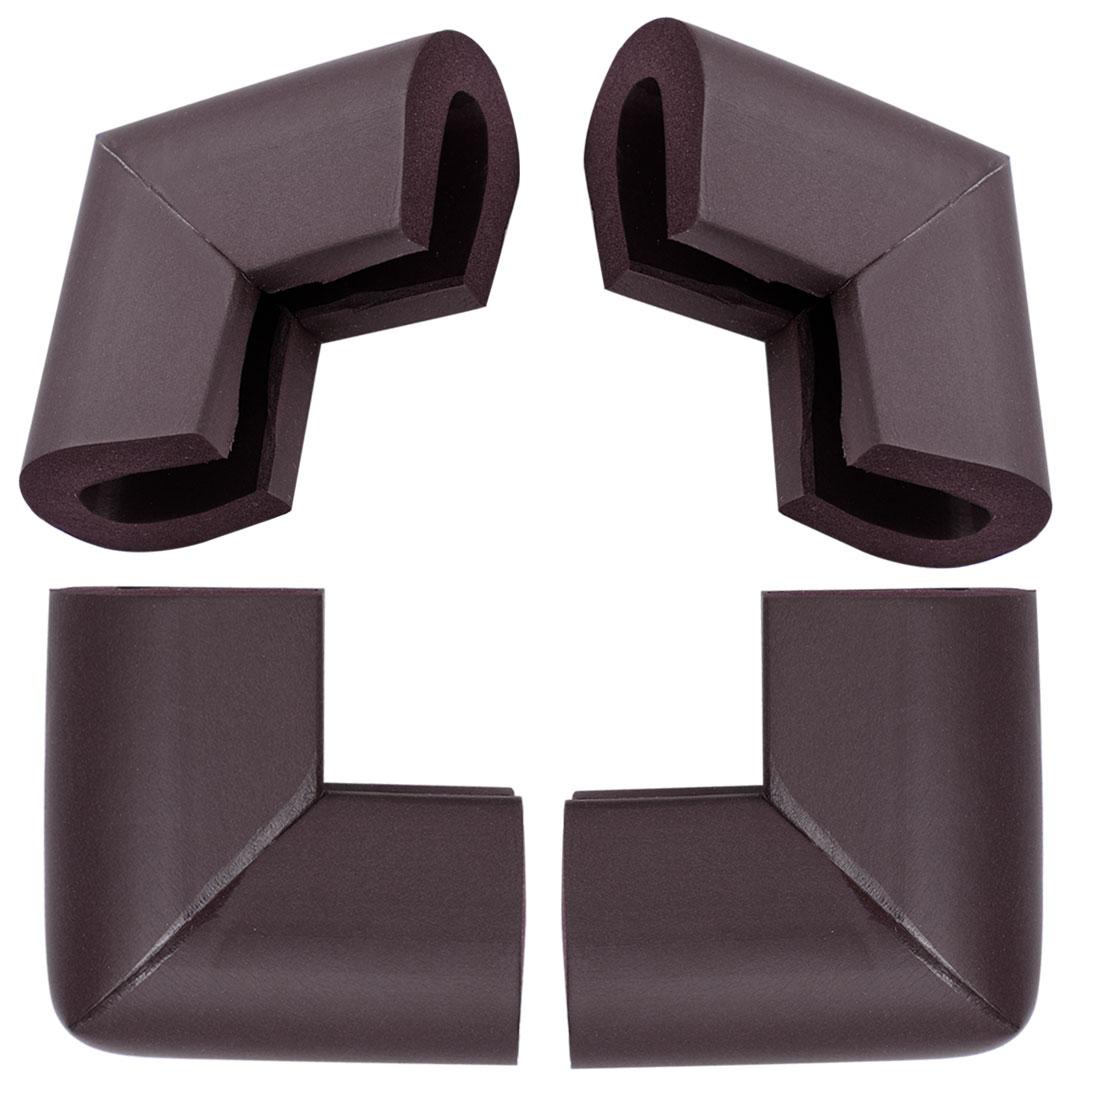 4pcs Edge Foam Corner Cushion Guards Strip Roll Soft Bumper Protector Dark Brown